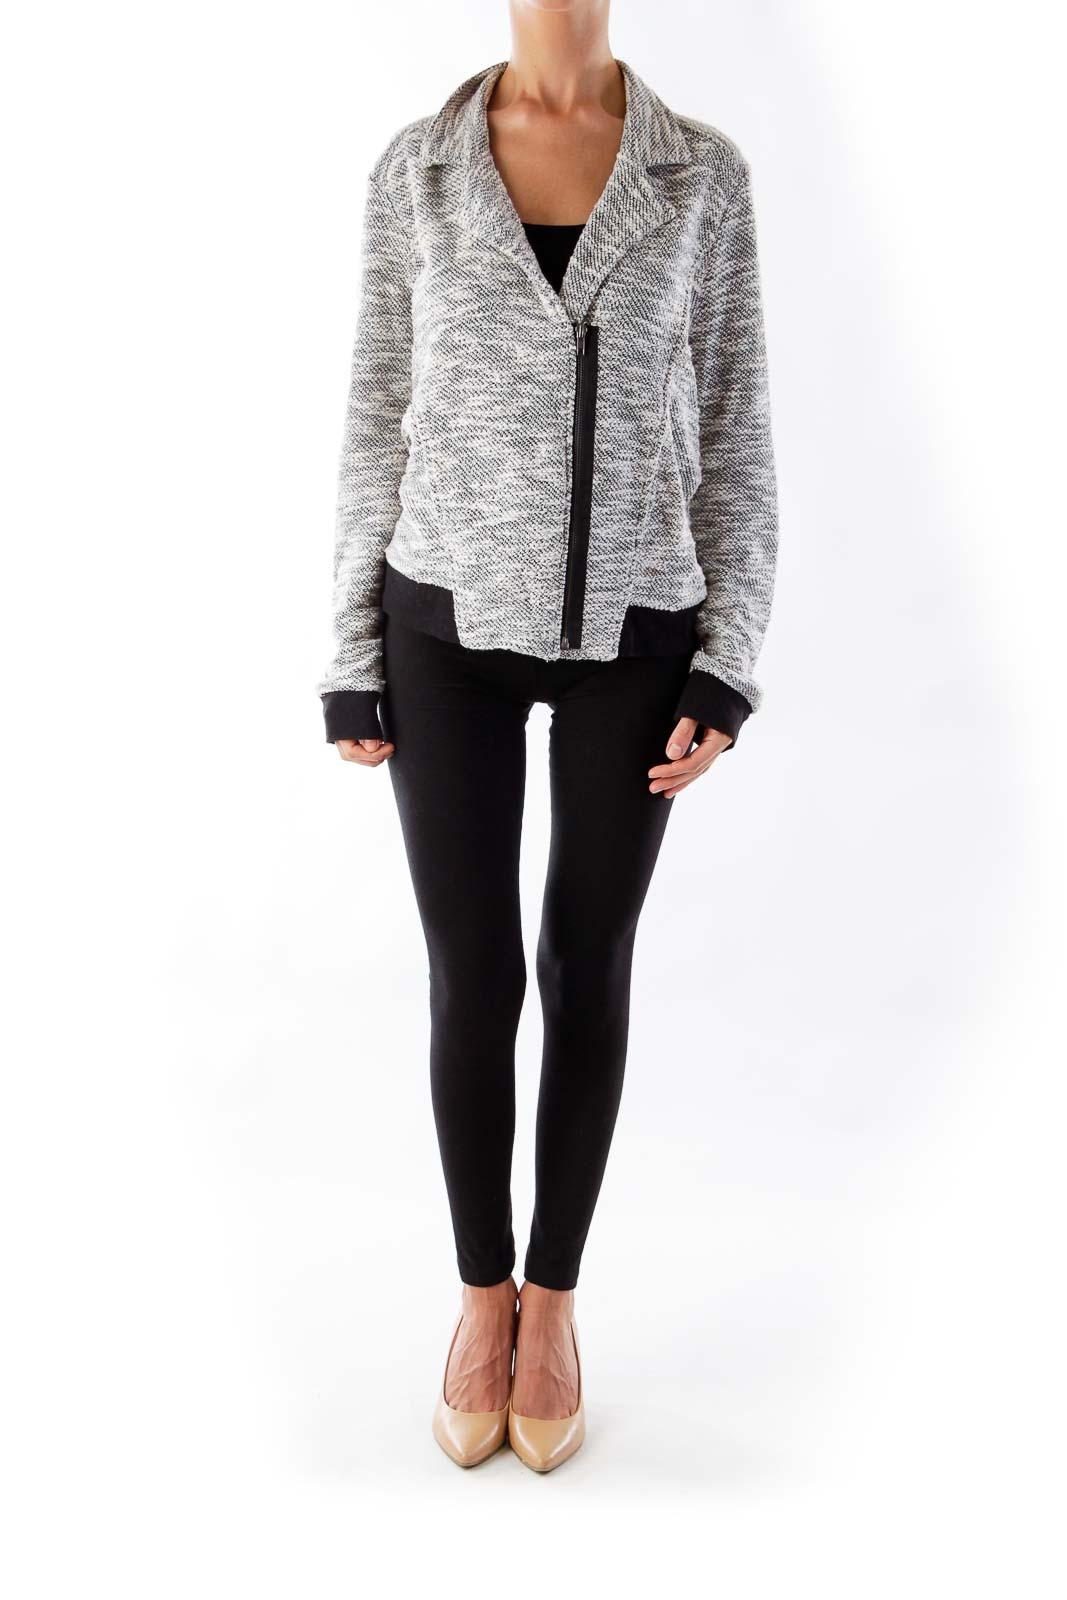 Black & Withe Zipper Jacket